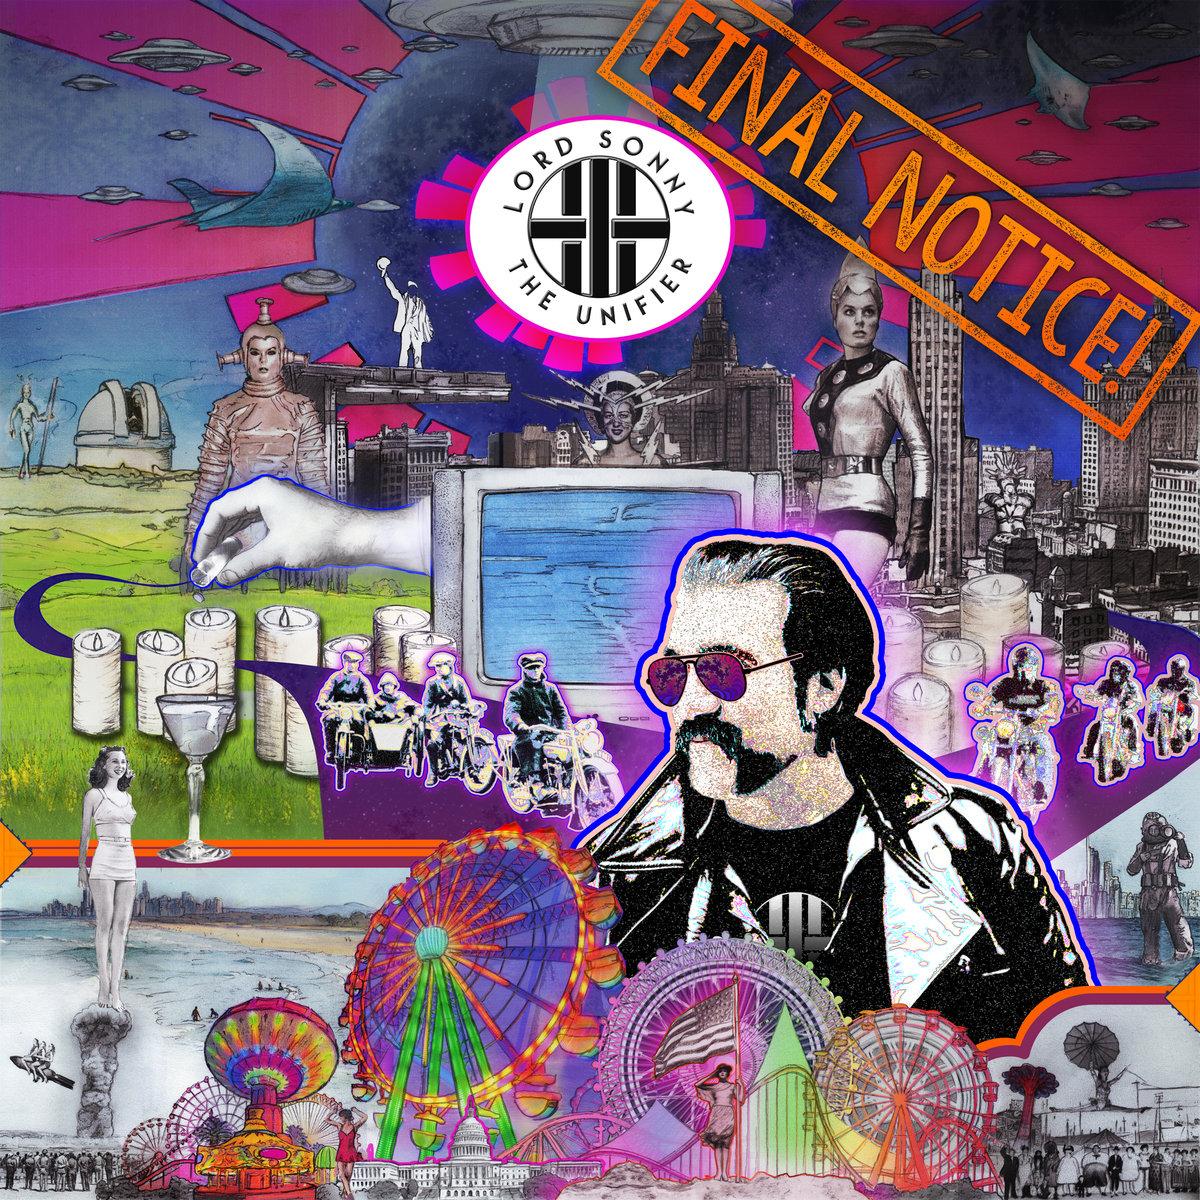 Final Notice! cover artwork by Shaun Friesen